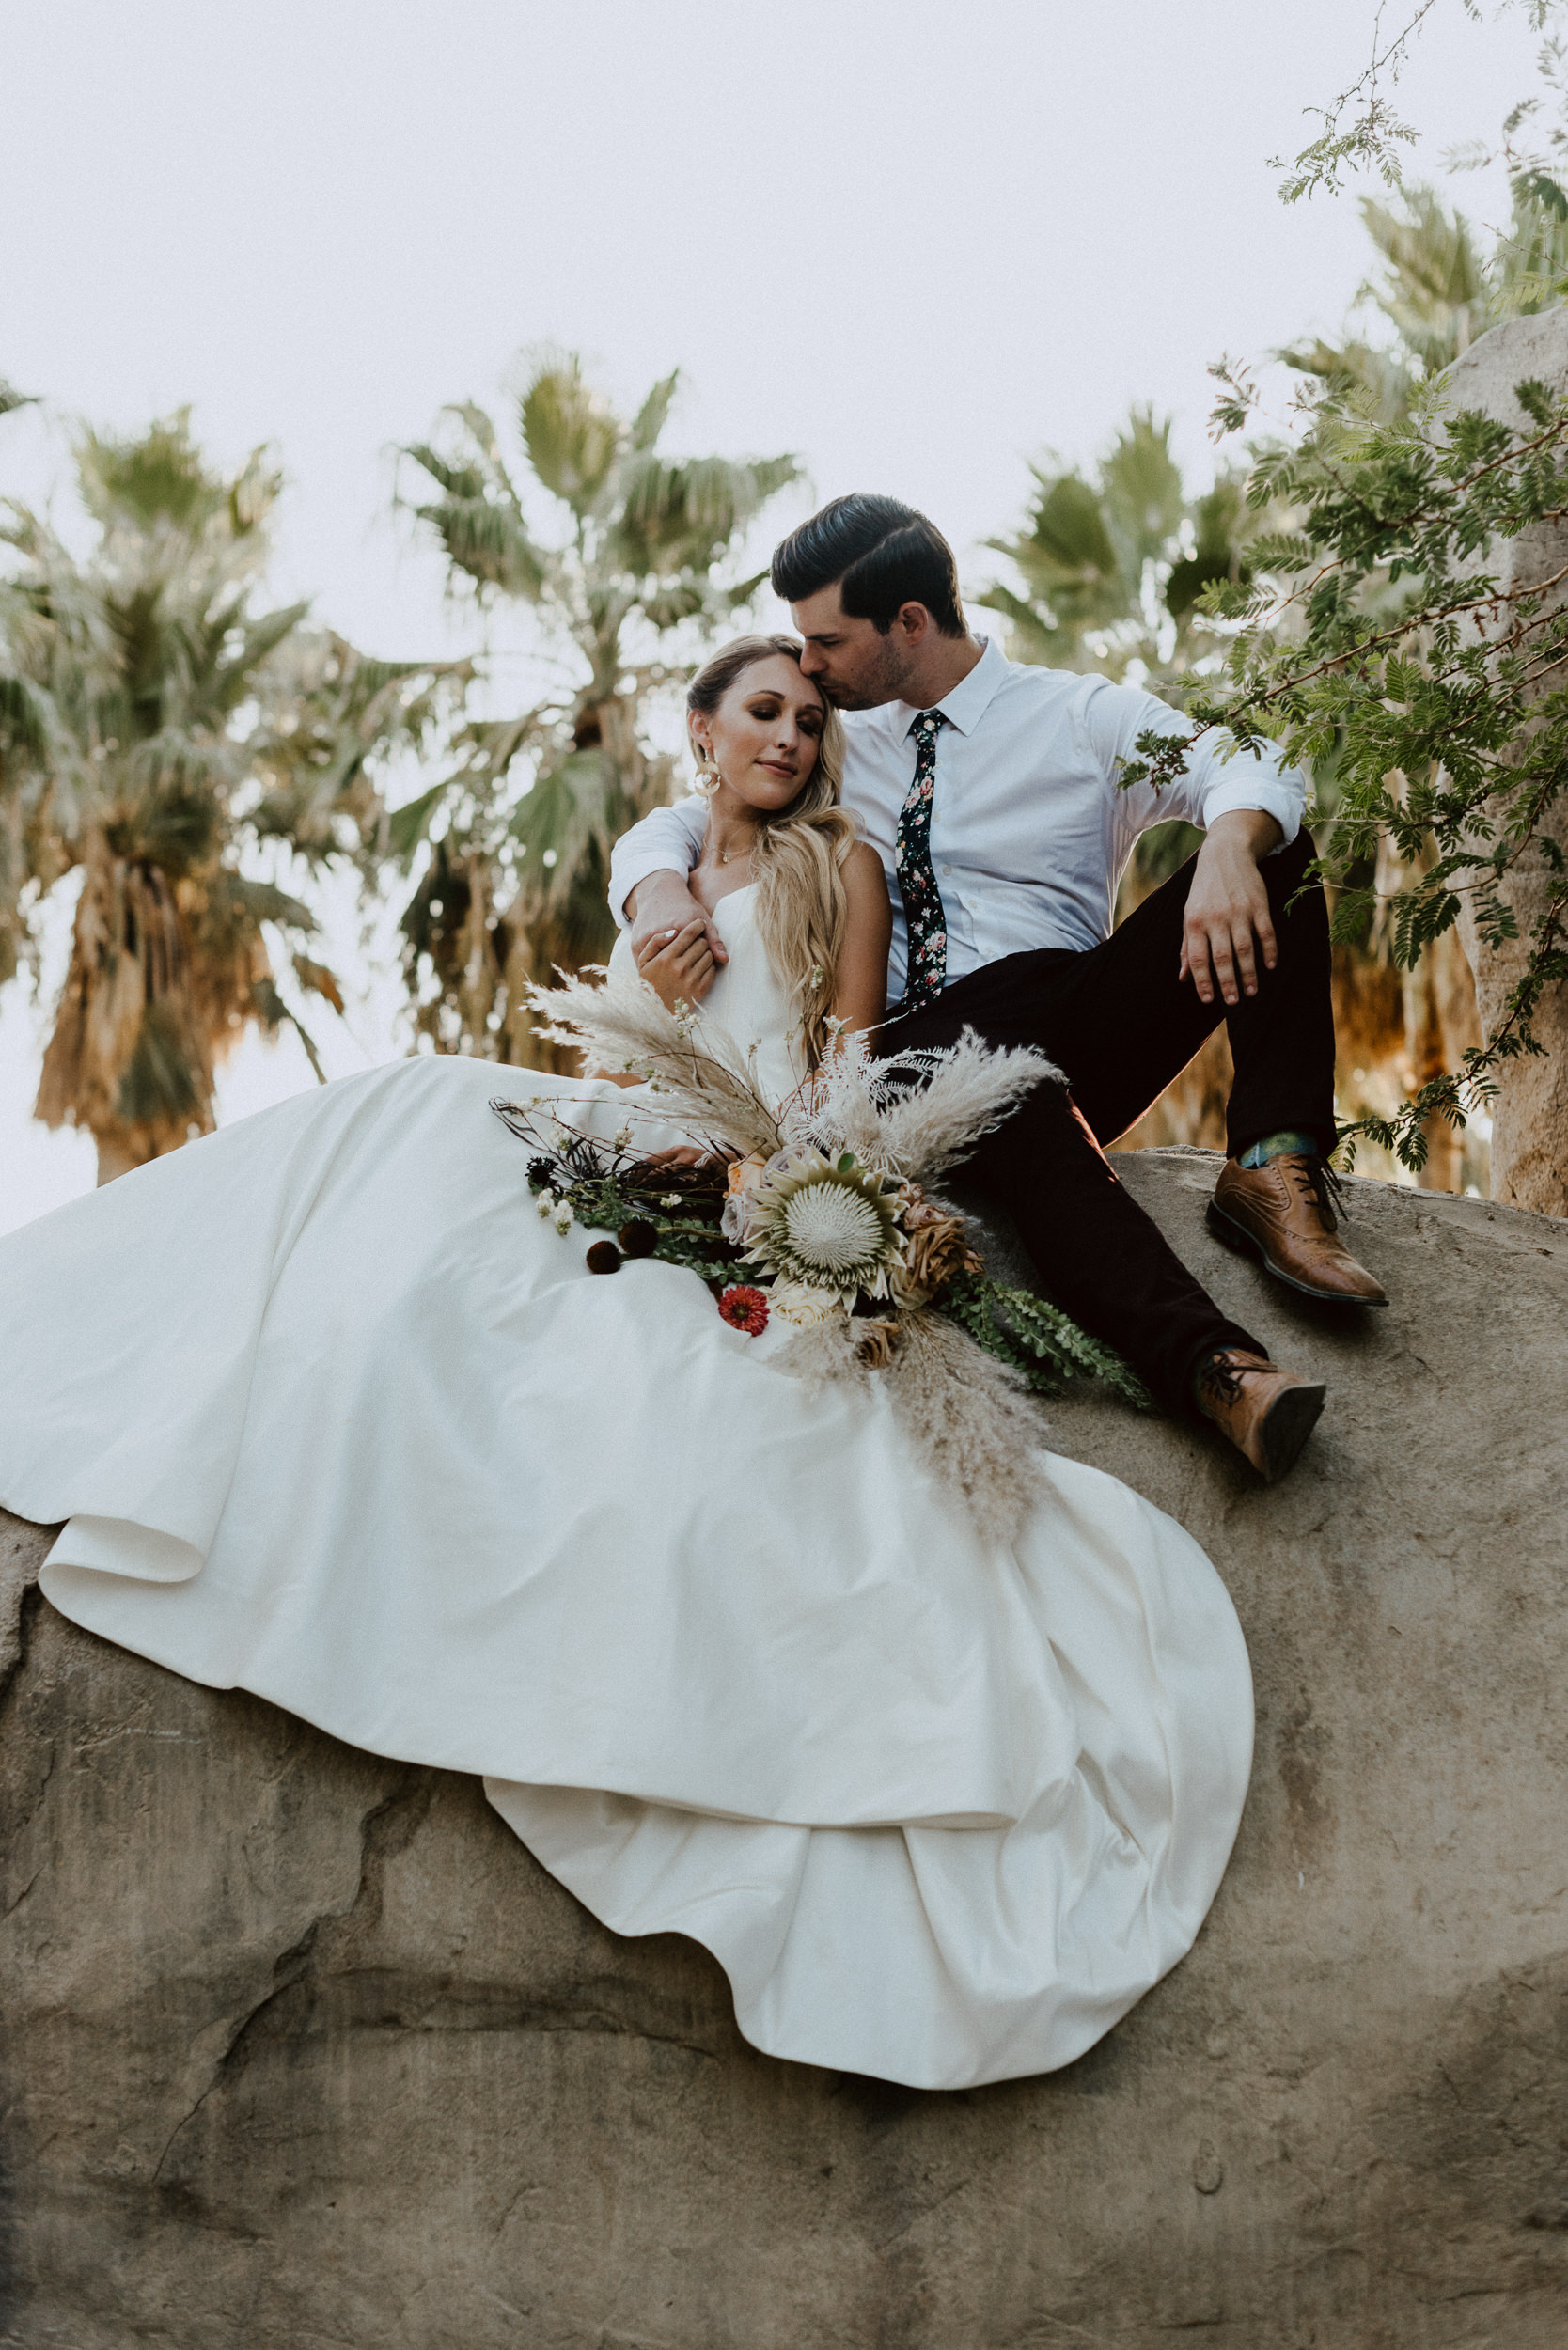 sChelsie + Chris - The Desert Shootout Wedding Romantics at The Living Desert-102.jpg